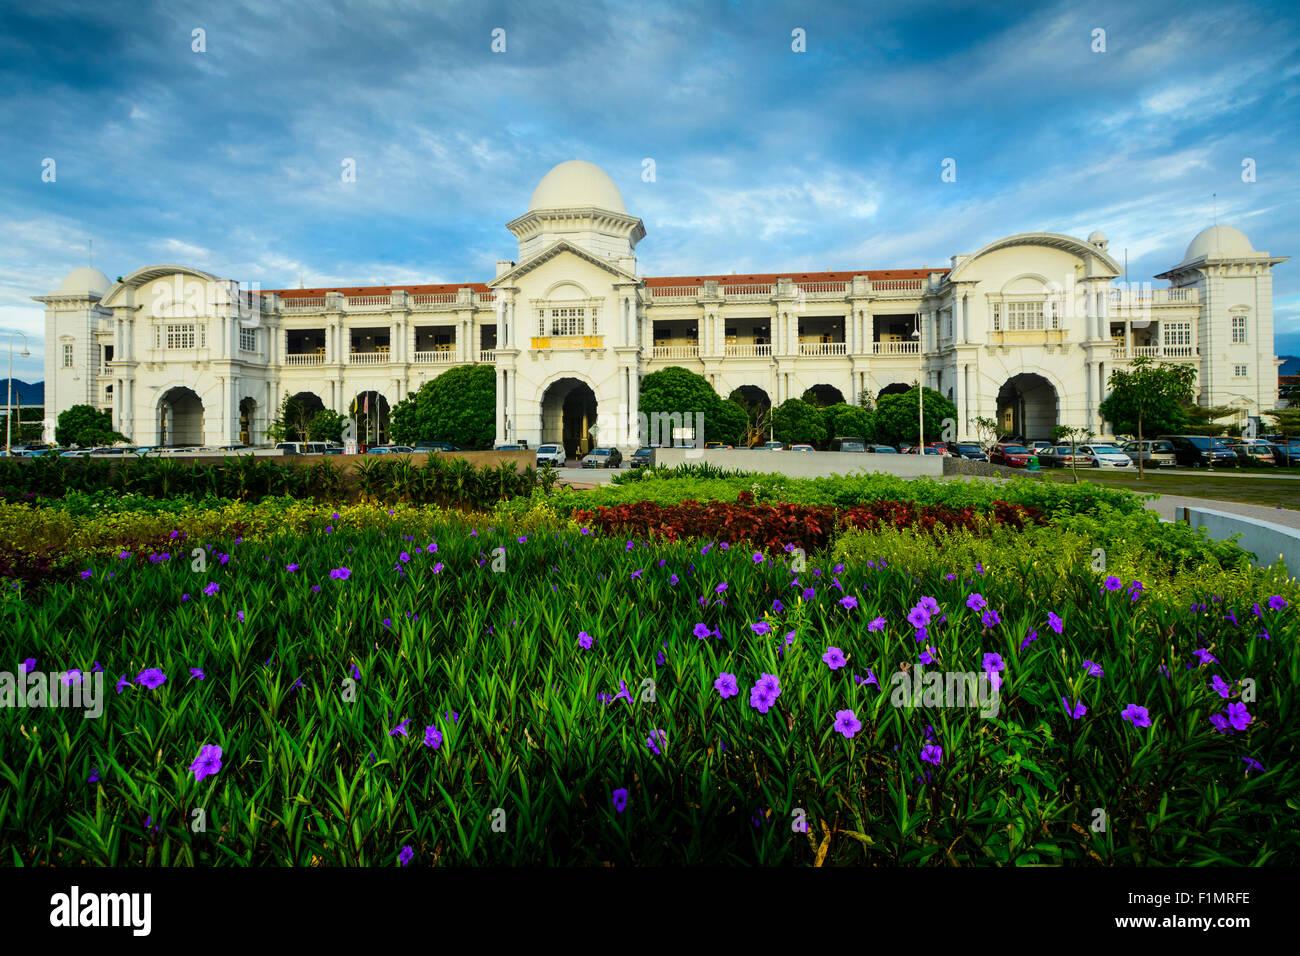 ipoh-railway-station-F1MRFE.jpg